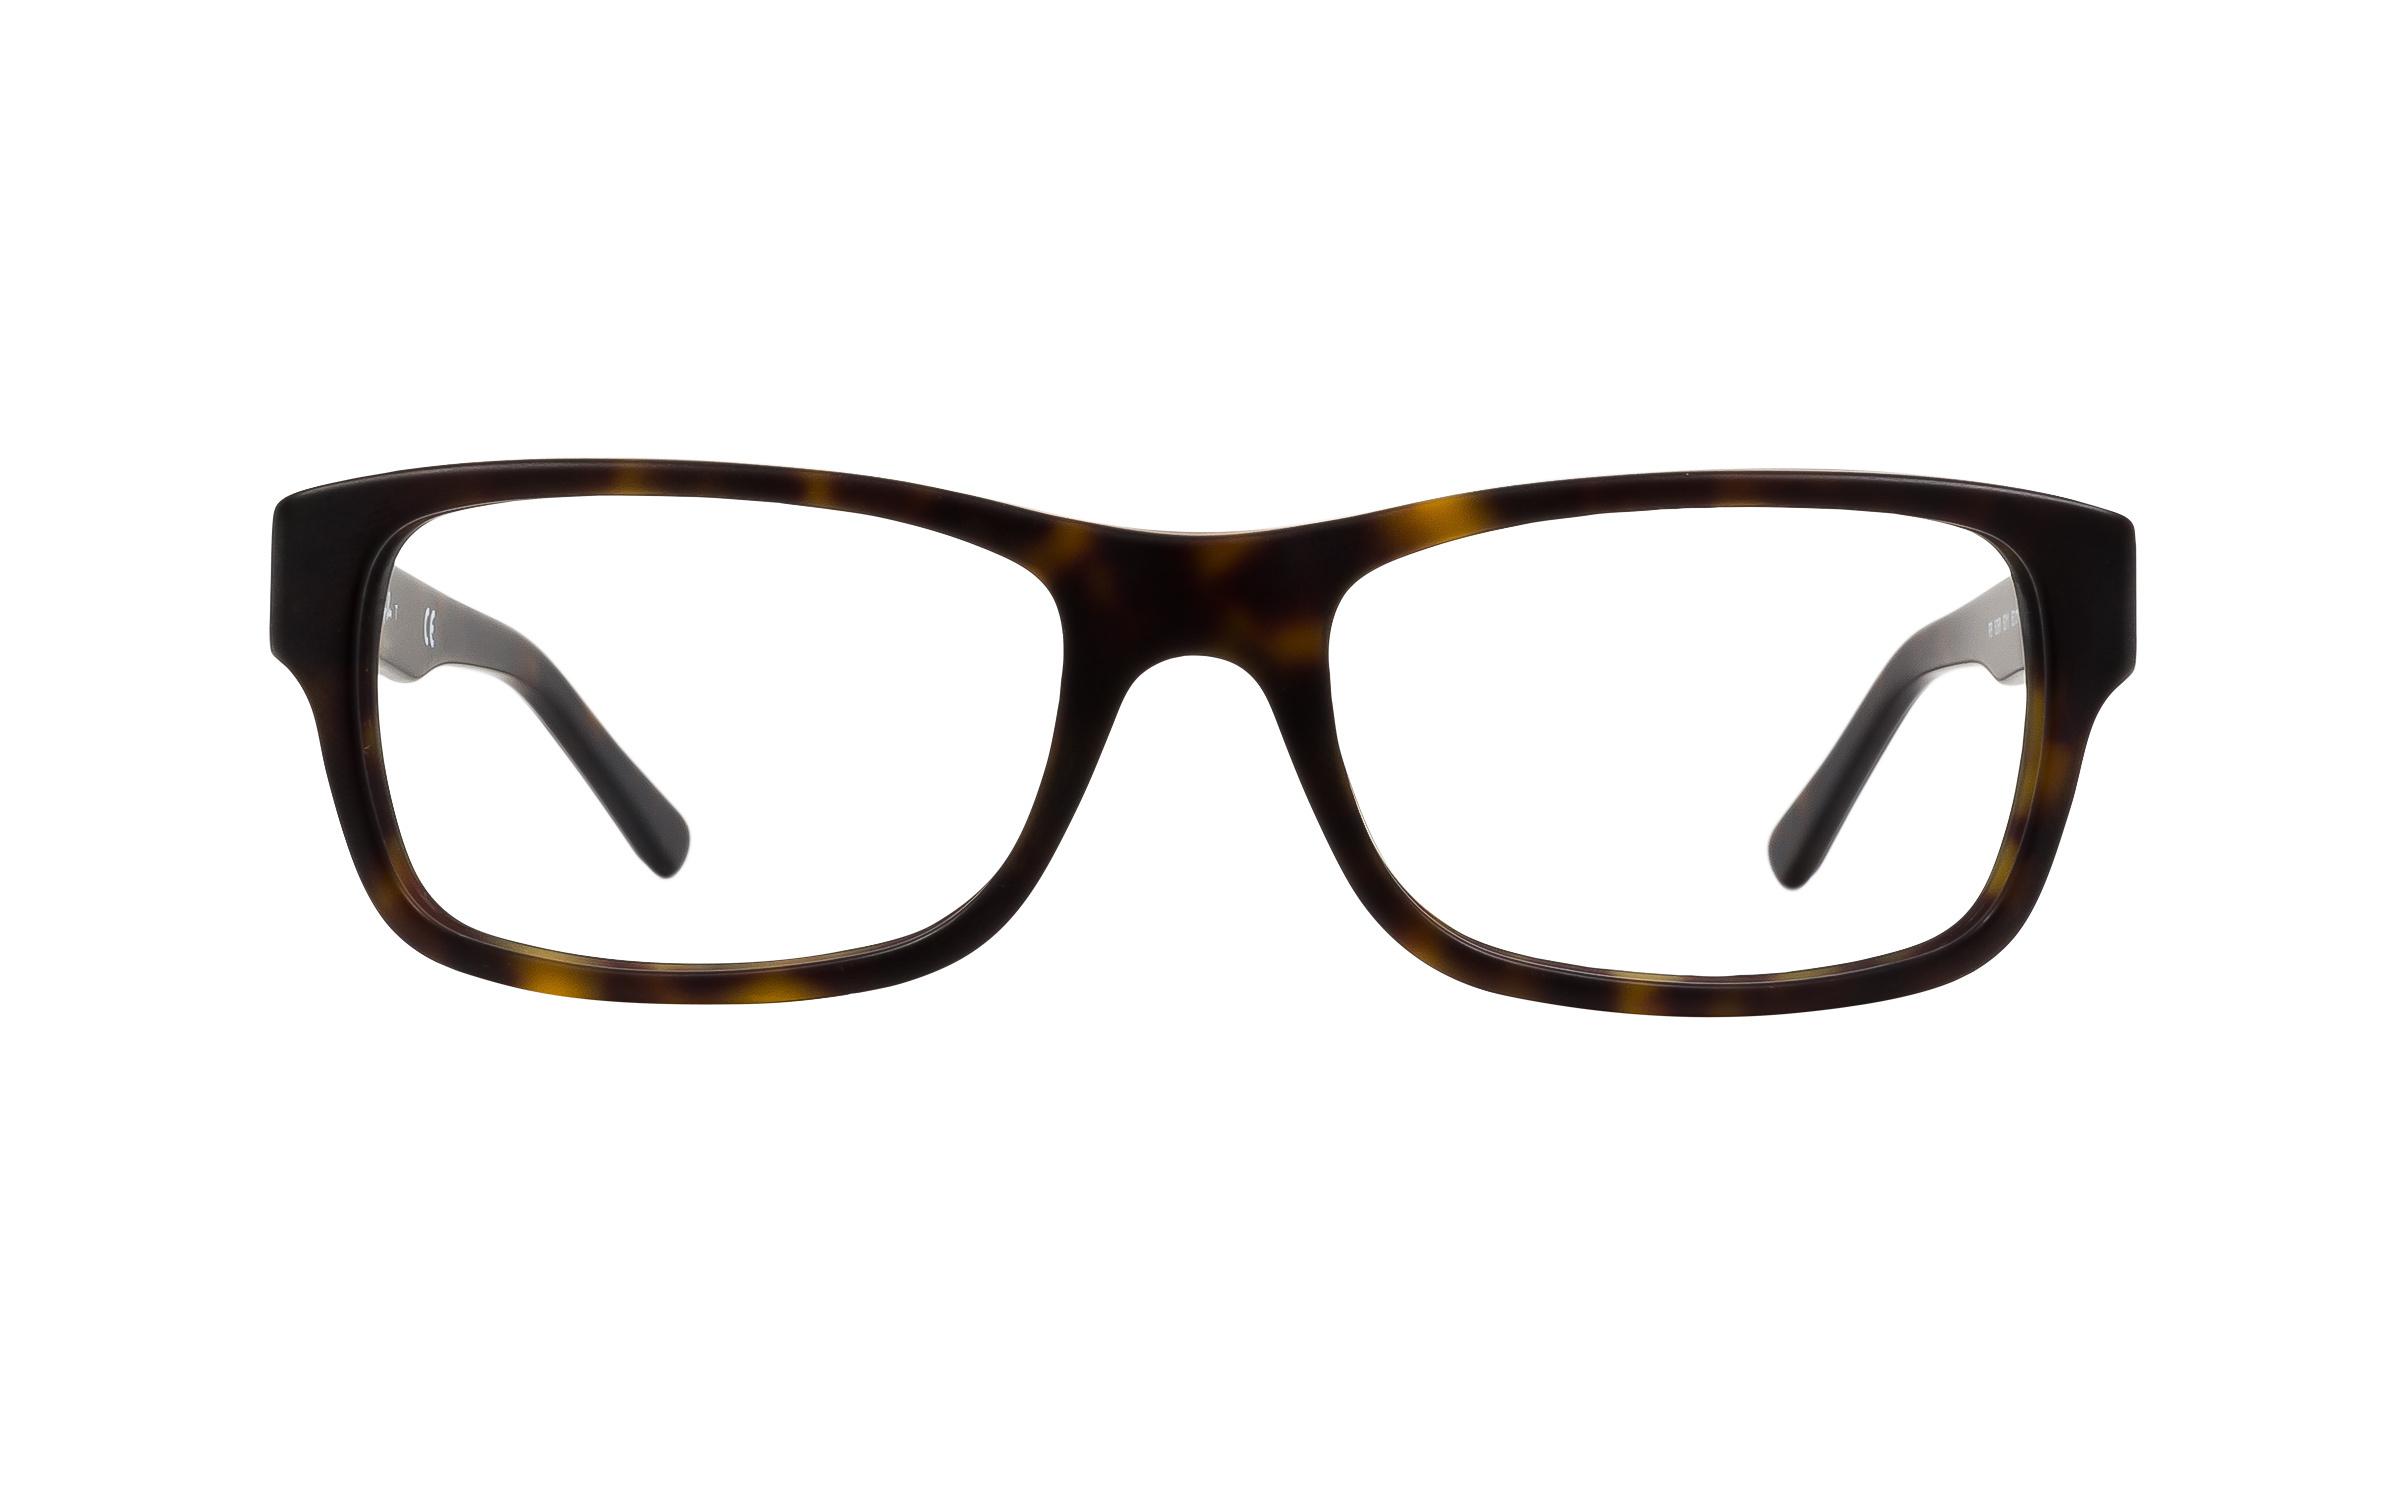 http://www.coastal.com/ - Ray-Ban Glasses Vintage Tortoise Acetate Online Coastal